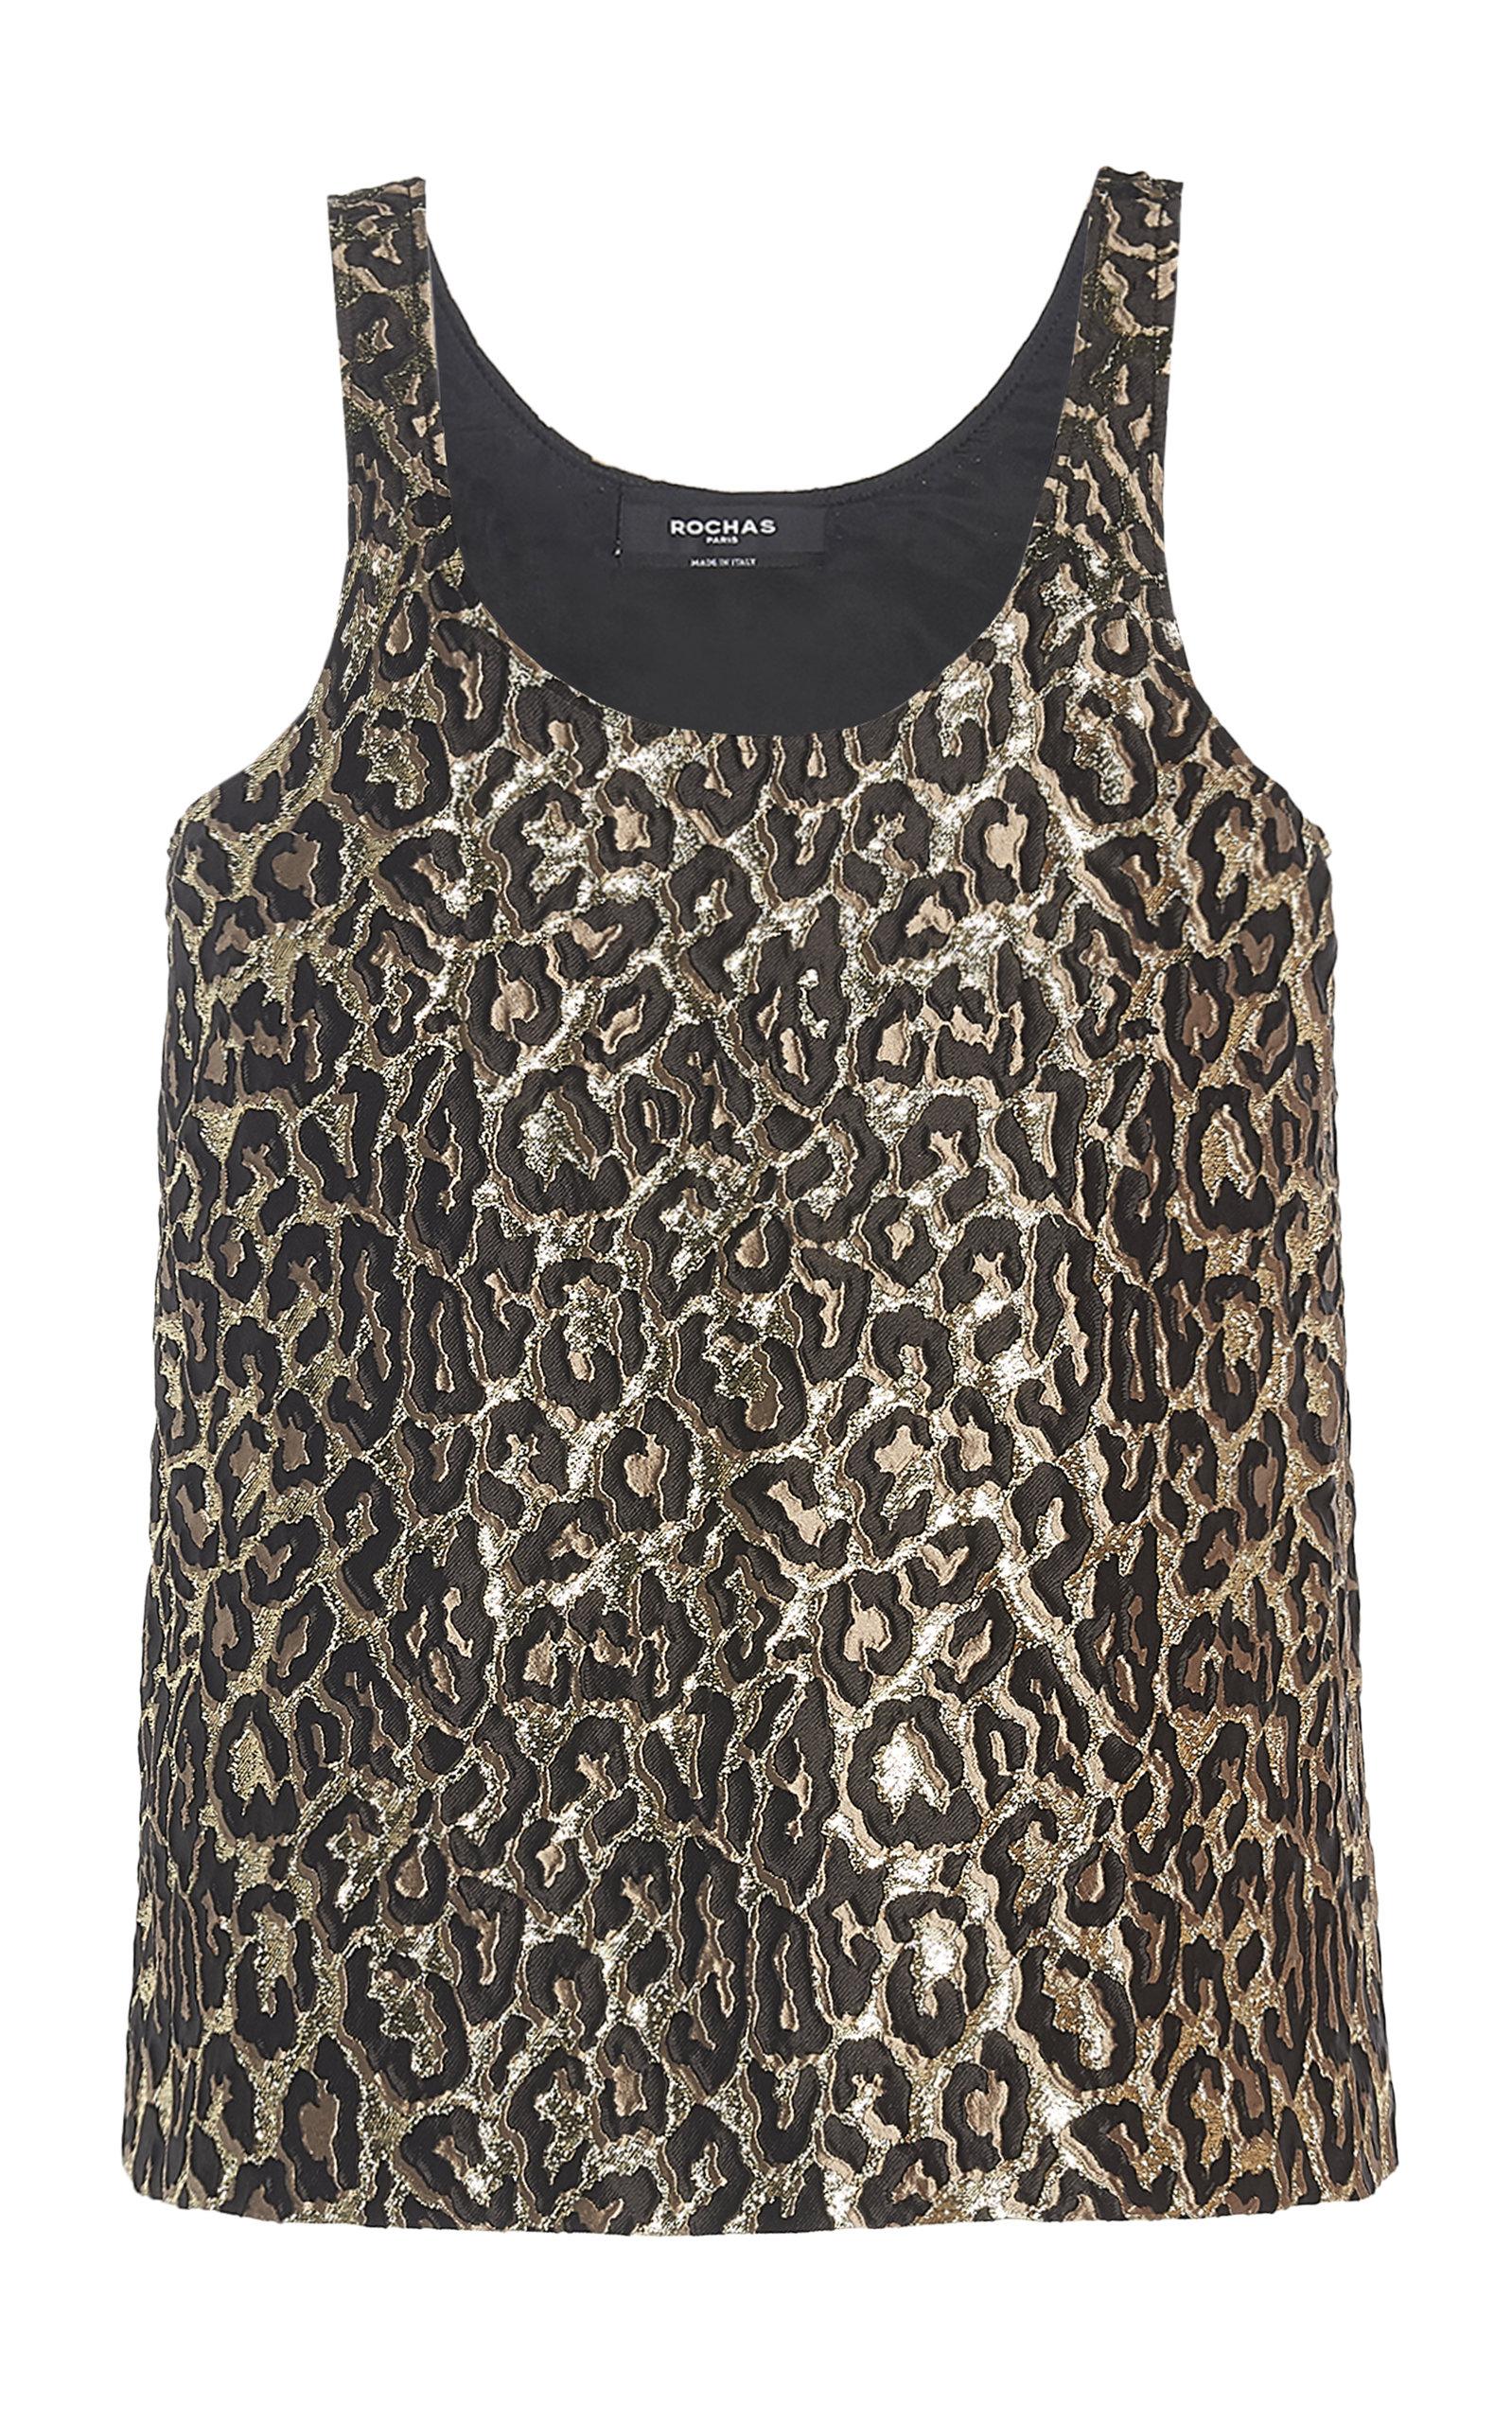 ROCHAS | Rochas Octavia Leopard-Print Brocade Tank Top | Goxip